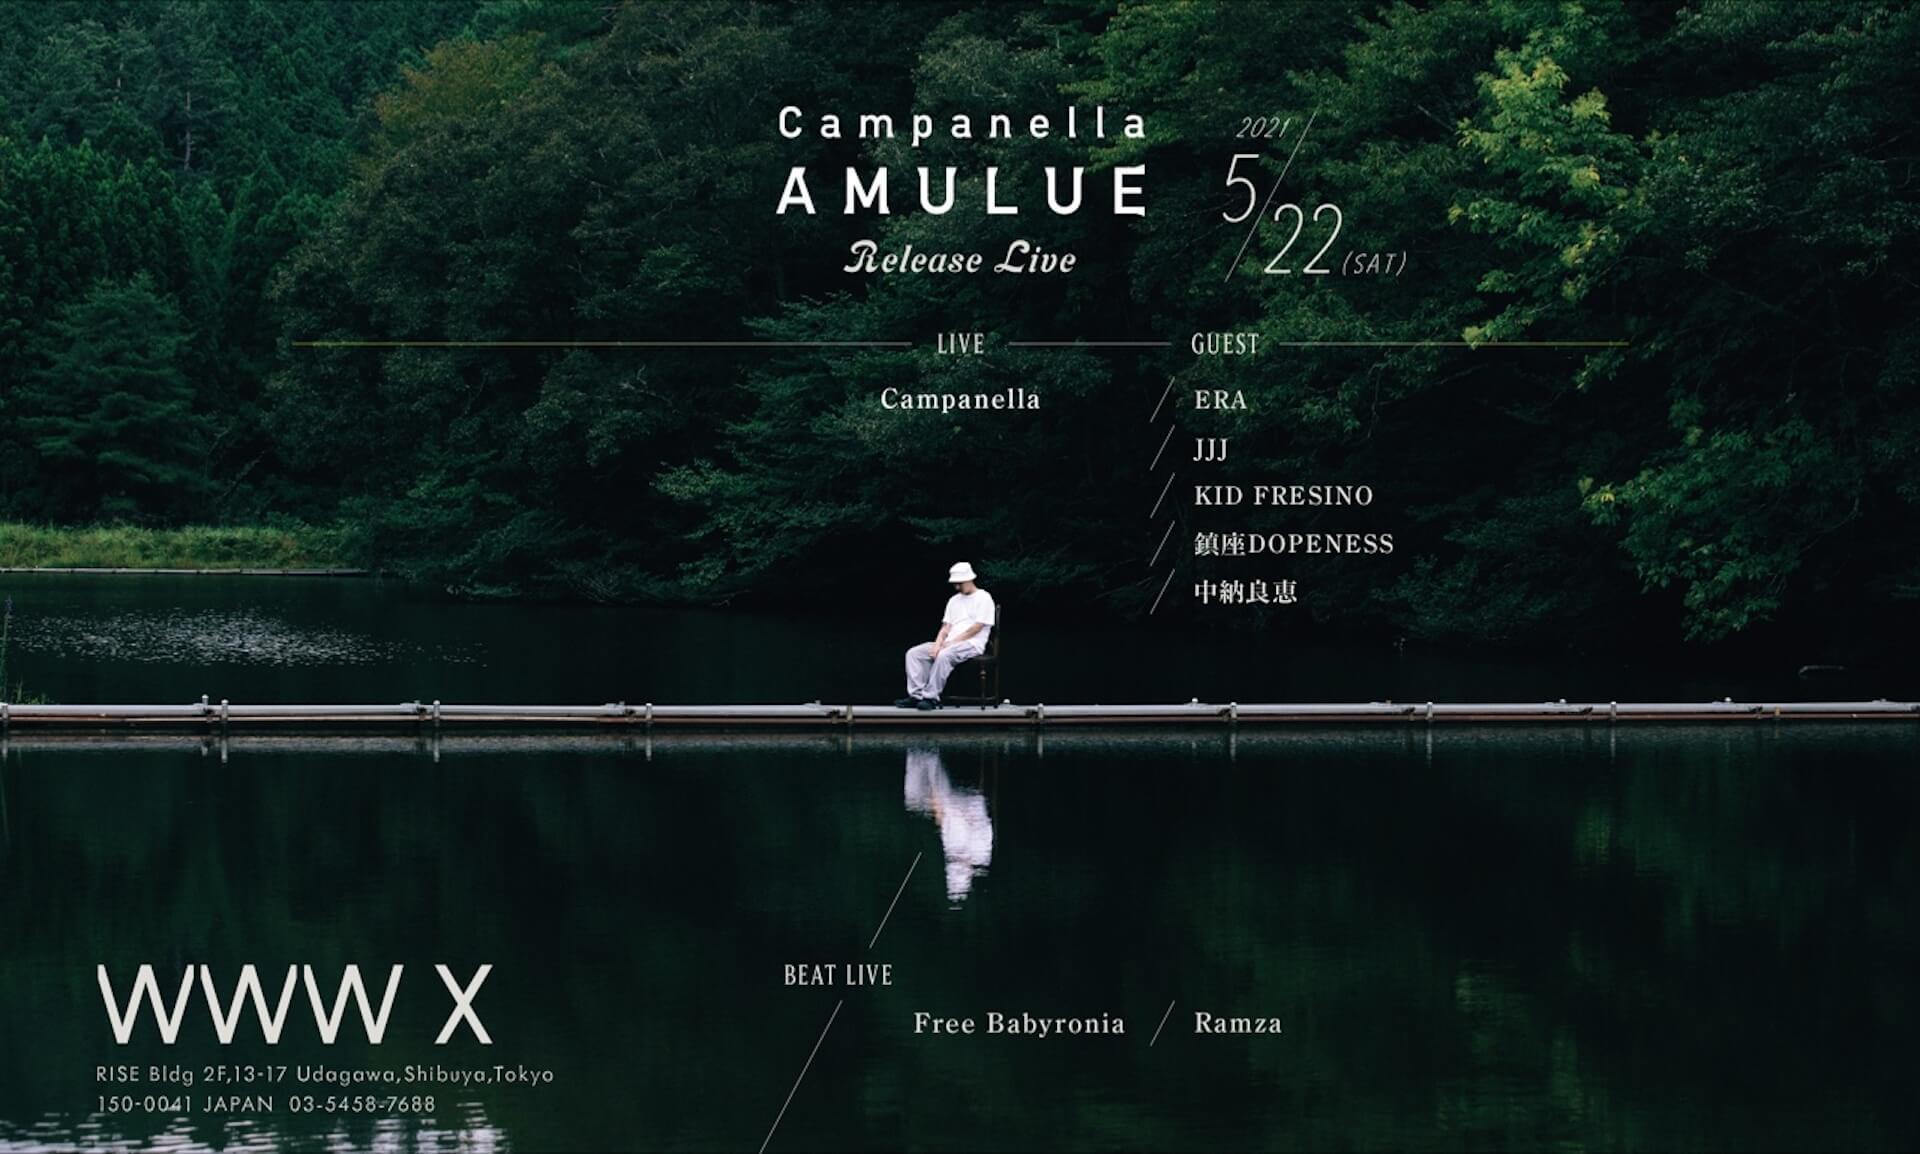 Campanellaの『AMULUE』リリースライブにERA、JJJ、KID FRESINO、鎮座DOPENESS、中納良恵の出演が決定! music210430_campanella_live_3